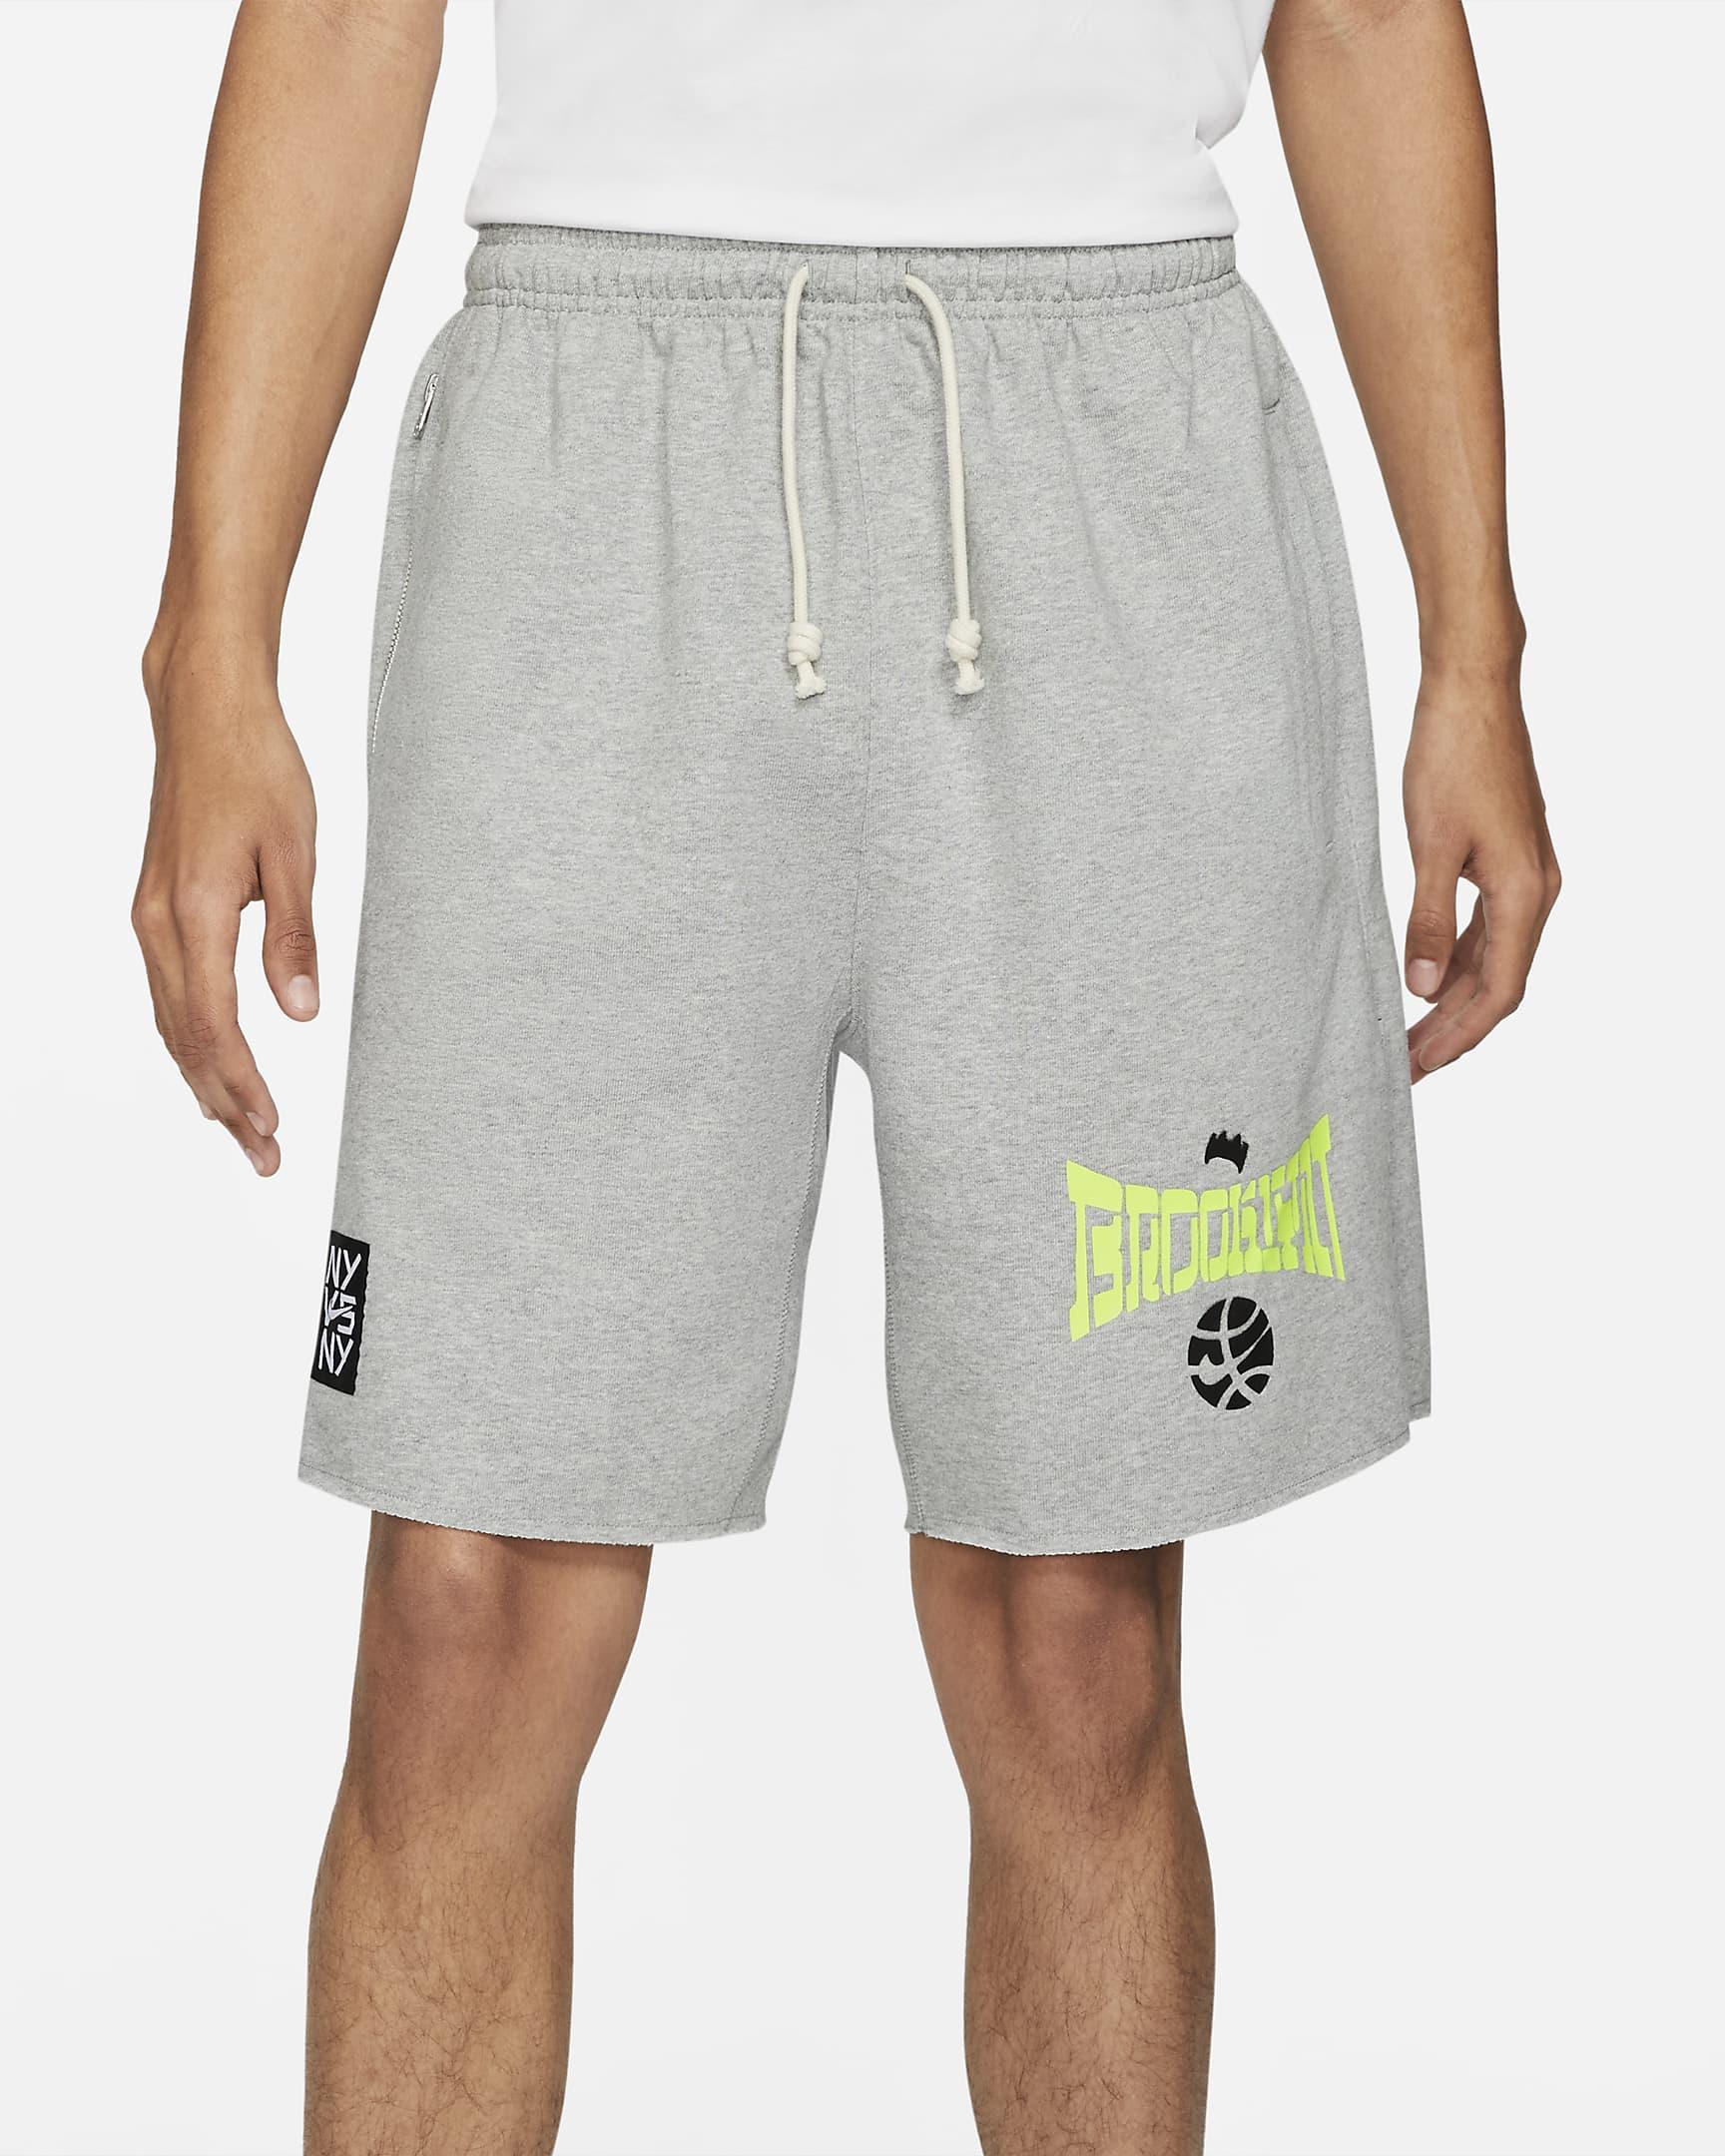 standard-issue-gersh-park-mens-basketball-fleece-shorts-VfcLxg.png